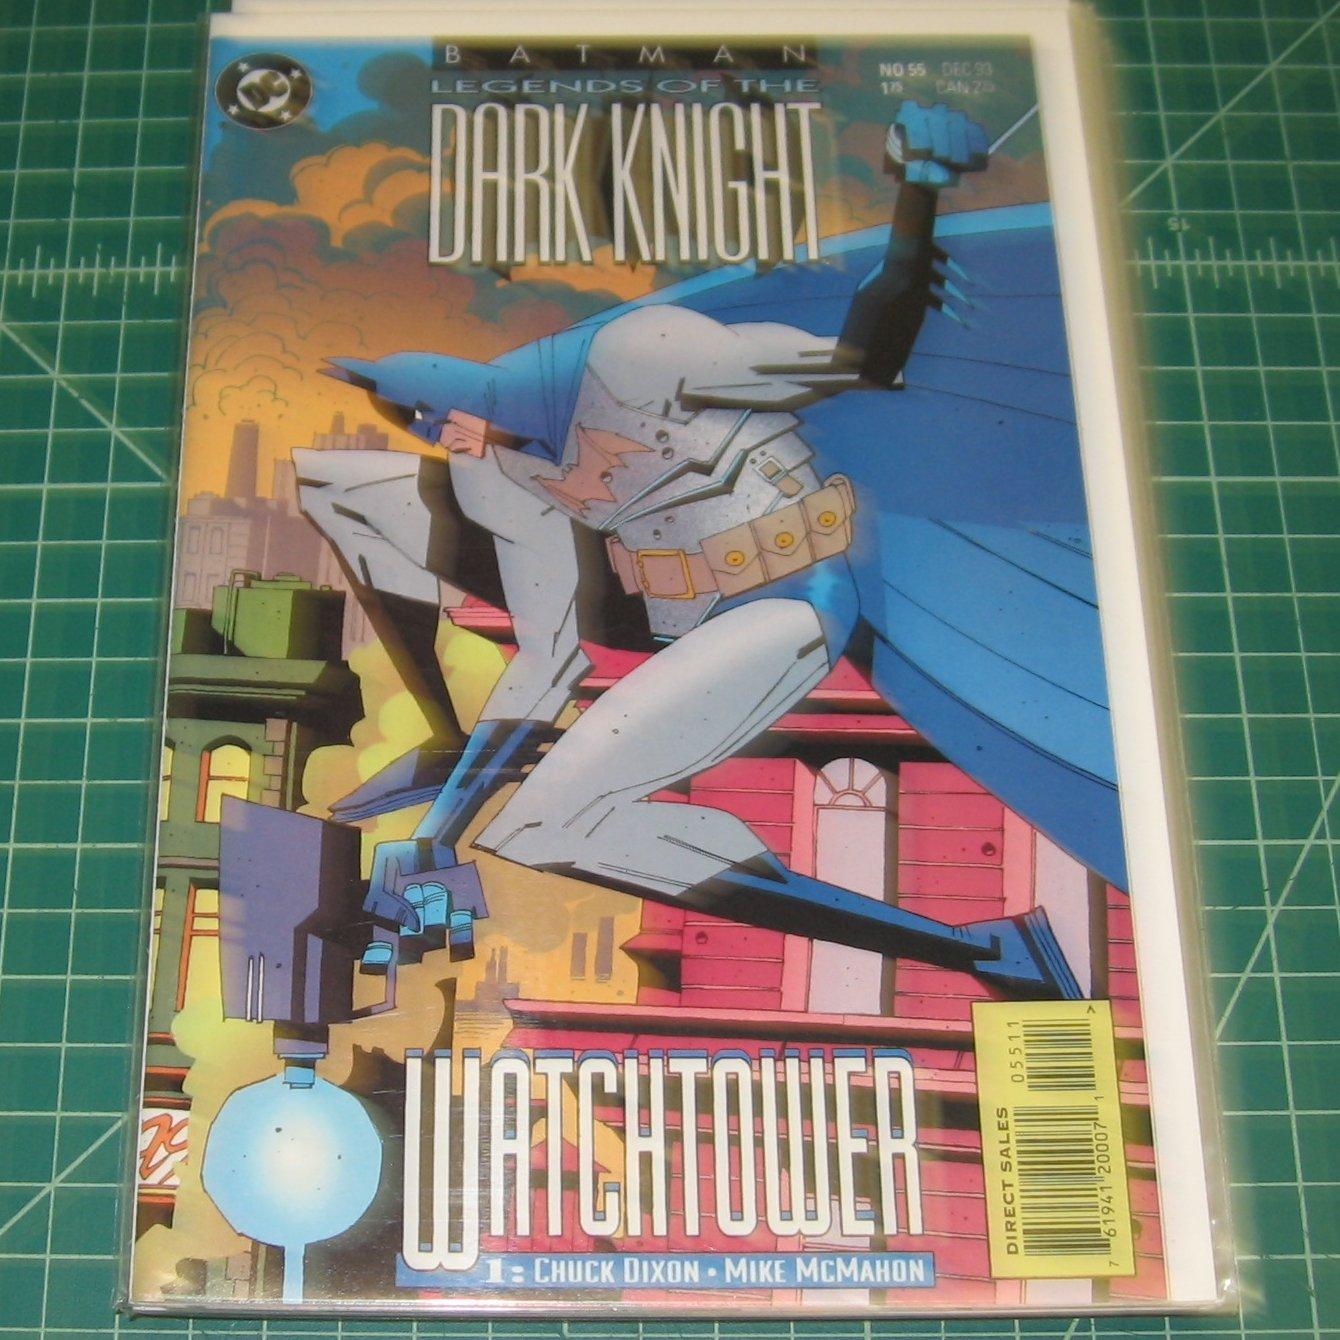 BATMAN Legends of the Dark Knight #55 - Chuck Dixon - 1993 DC Comics - FIRST PRINT